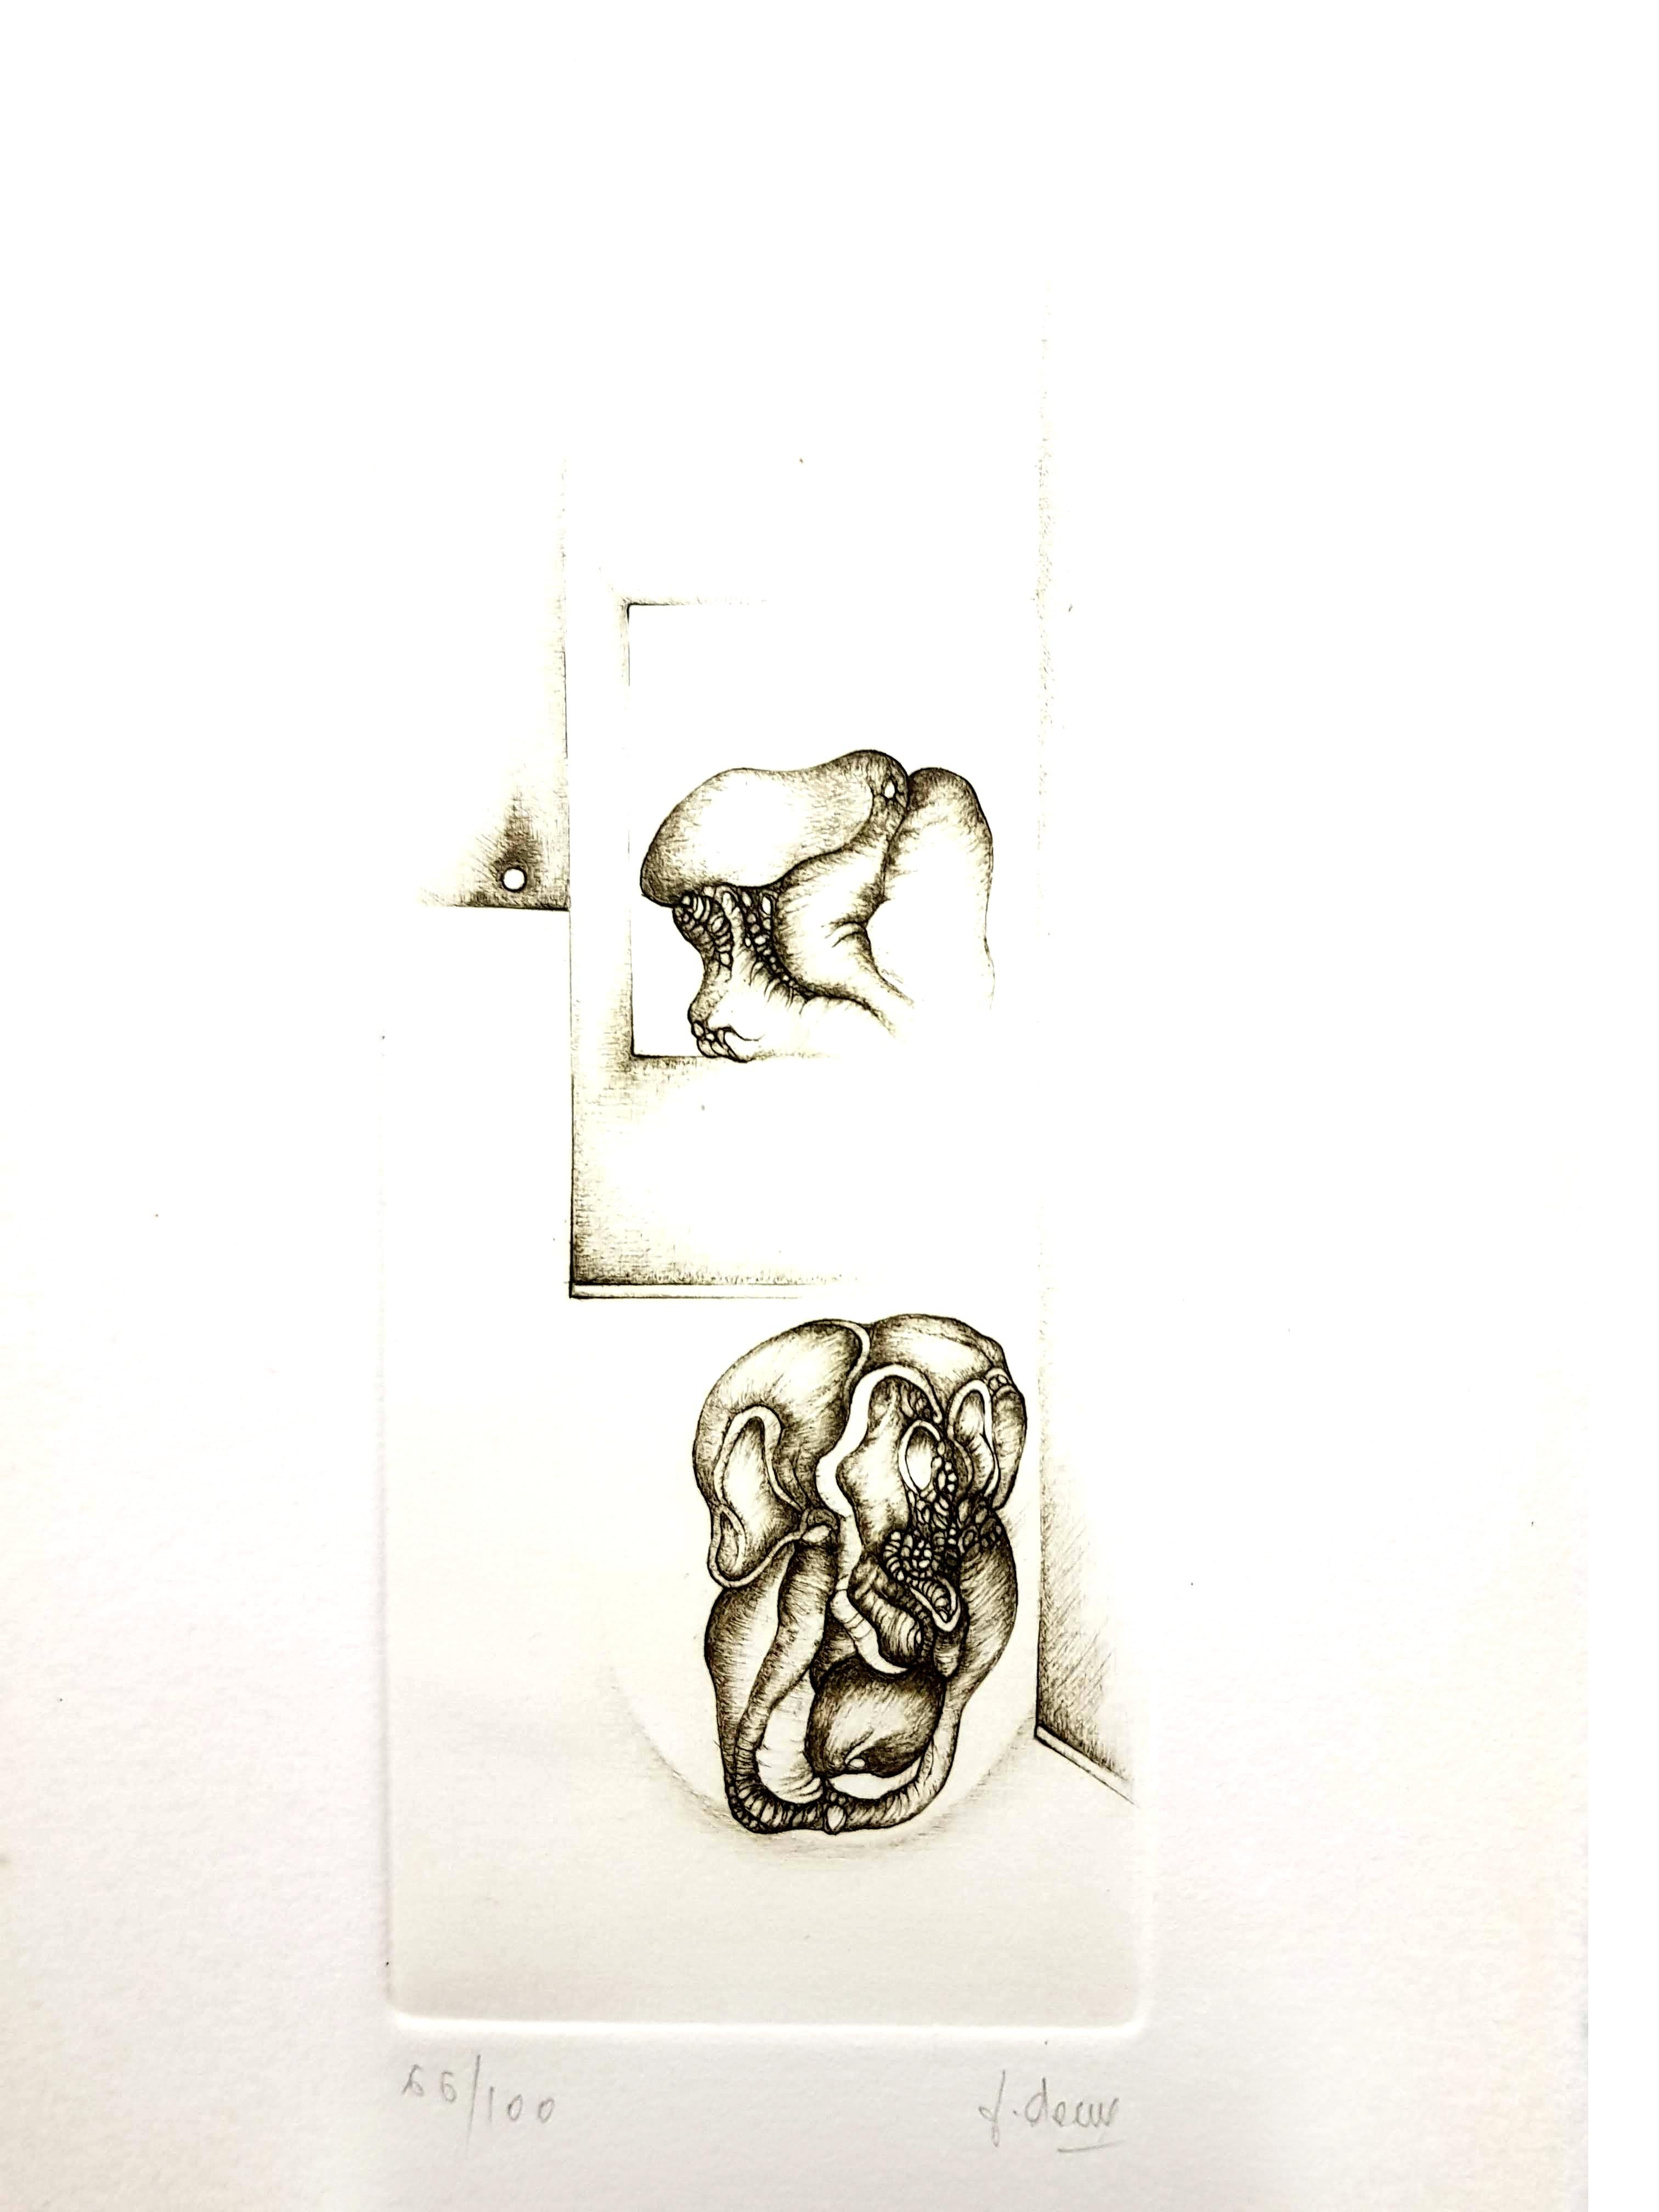 Fred Deux - Grey Surrealism II - Signed Original Etching